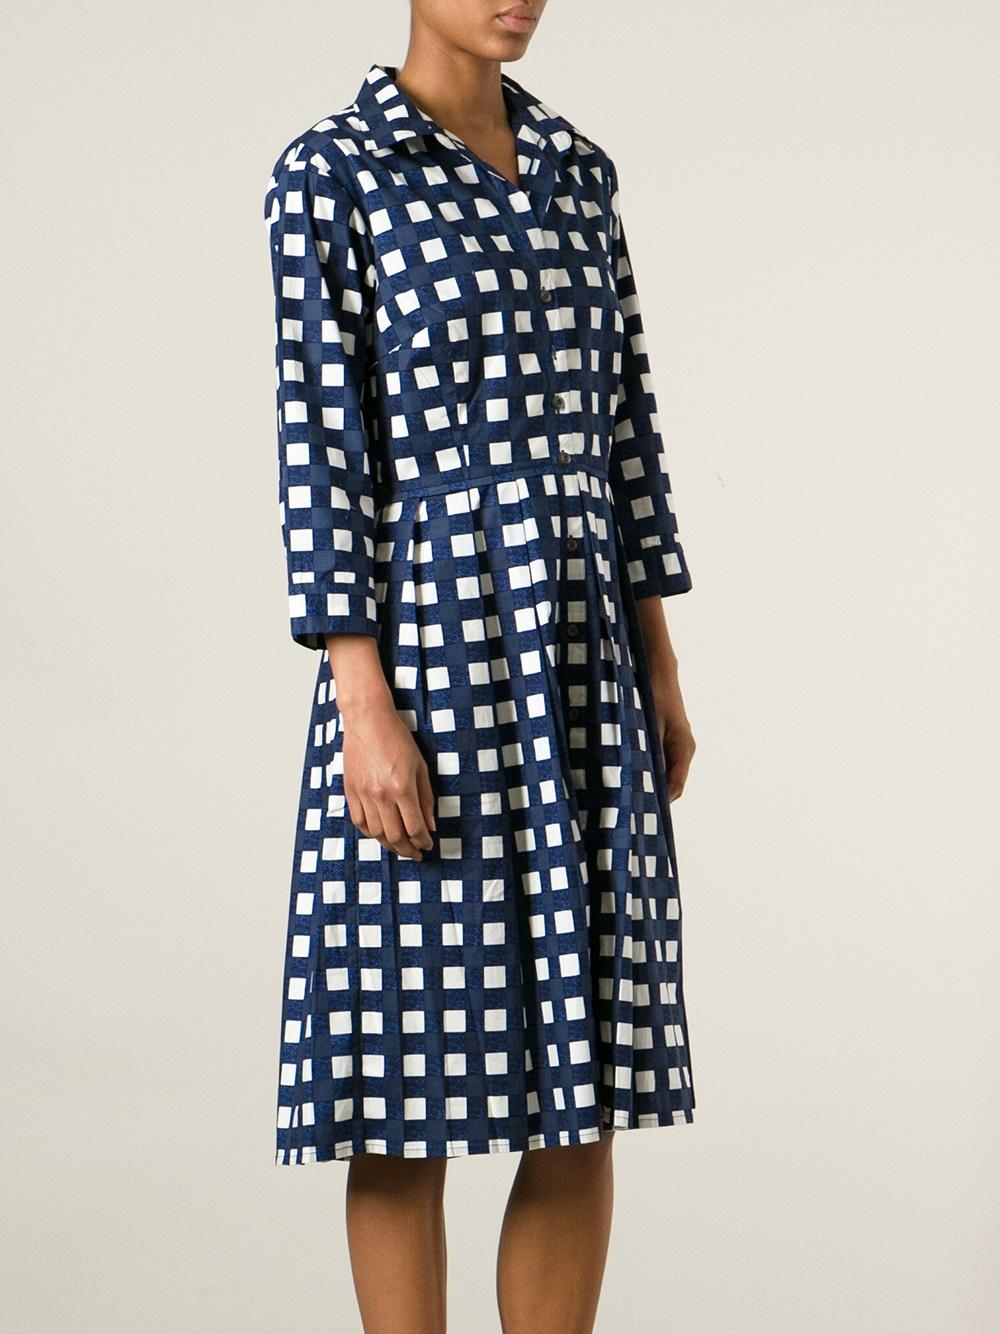 DRESSES - Short dresses Samantha Sung xP6JccP